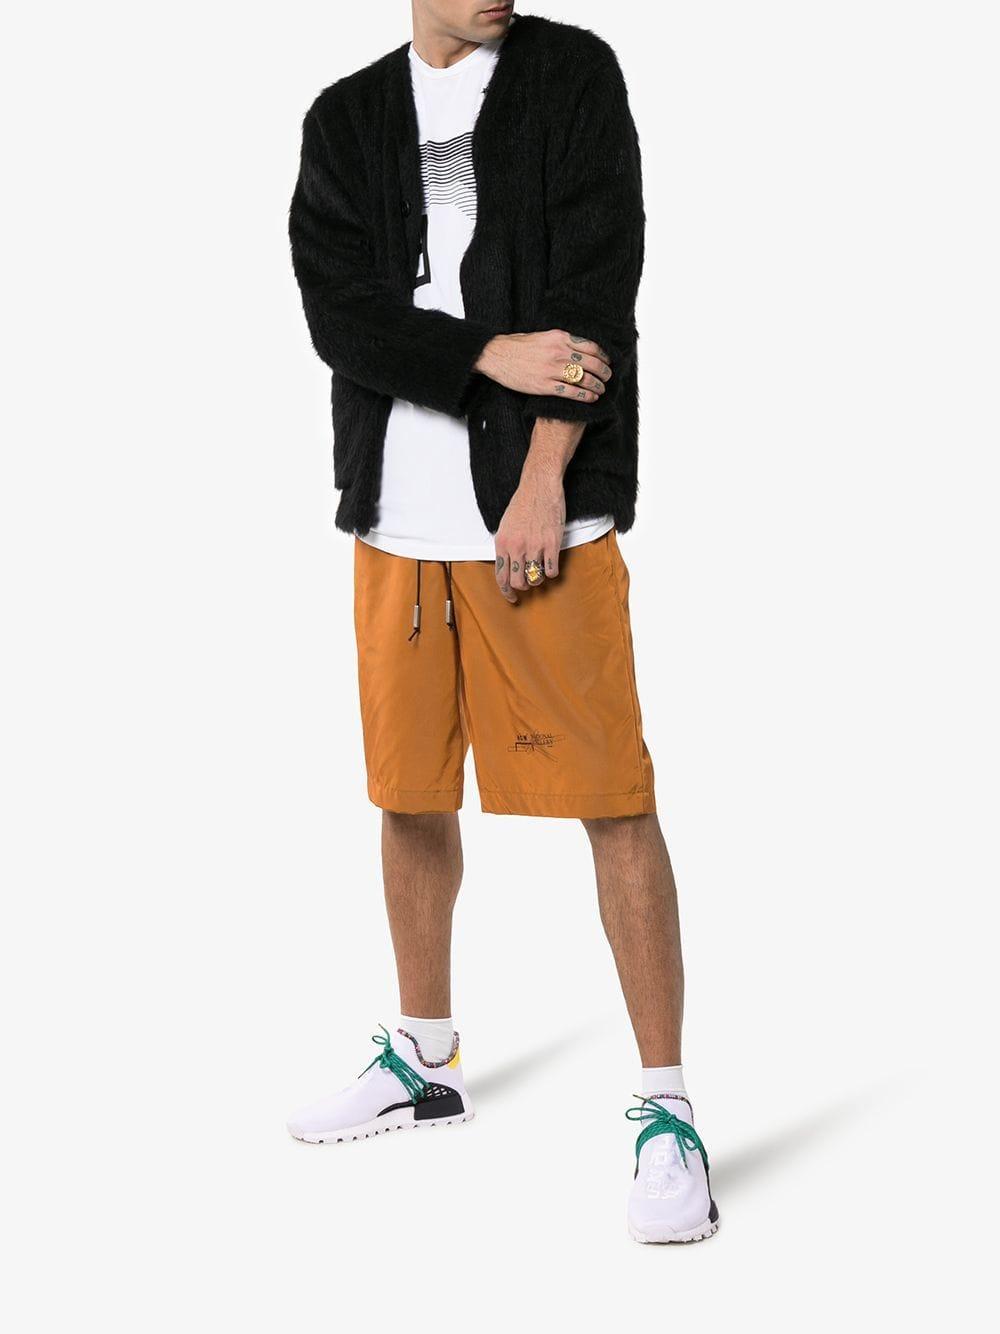 eba20c829 adidas X Pharrell Williams White Human Body Nmd Sneakers in White for Men -  Lyst